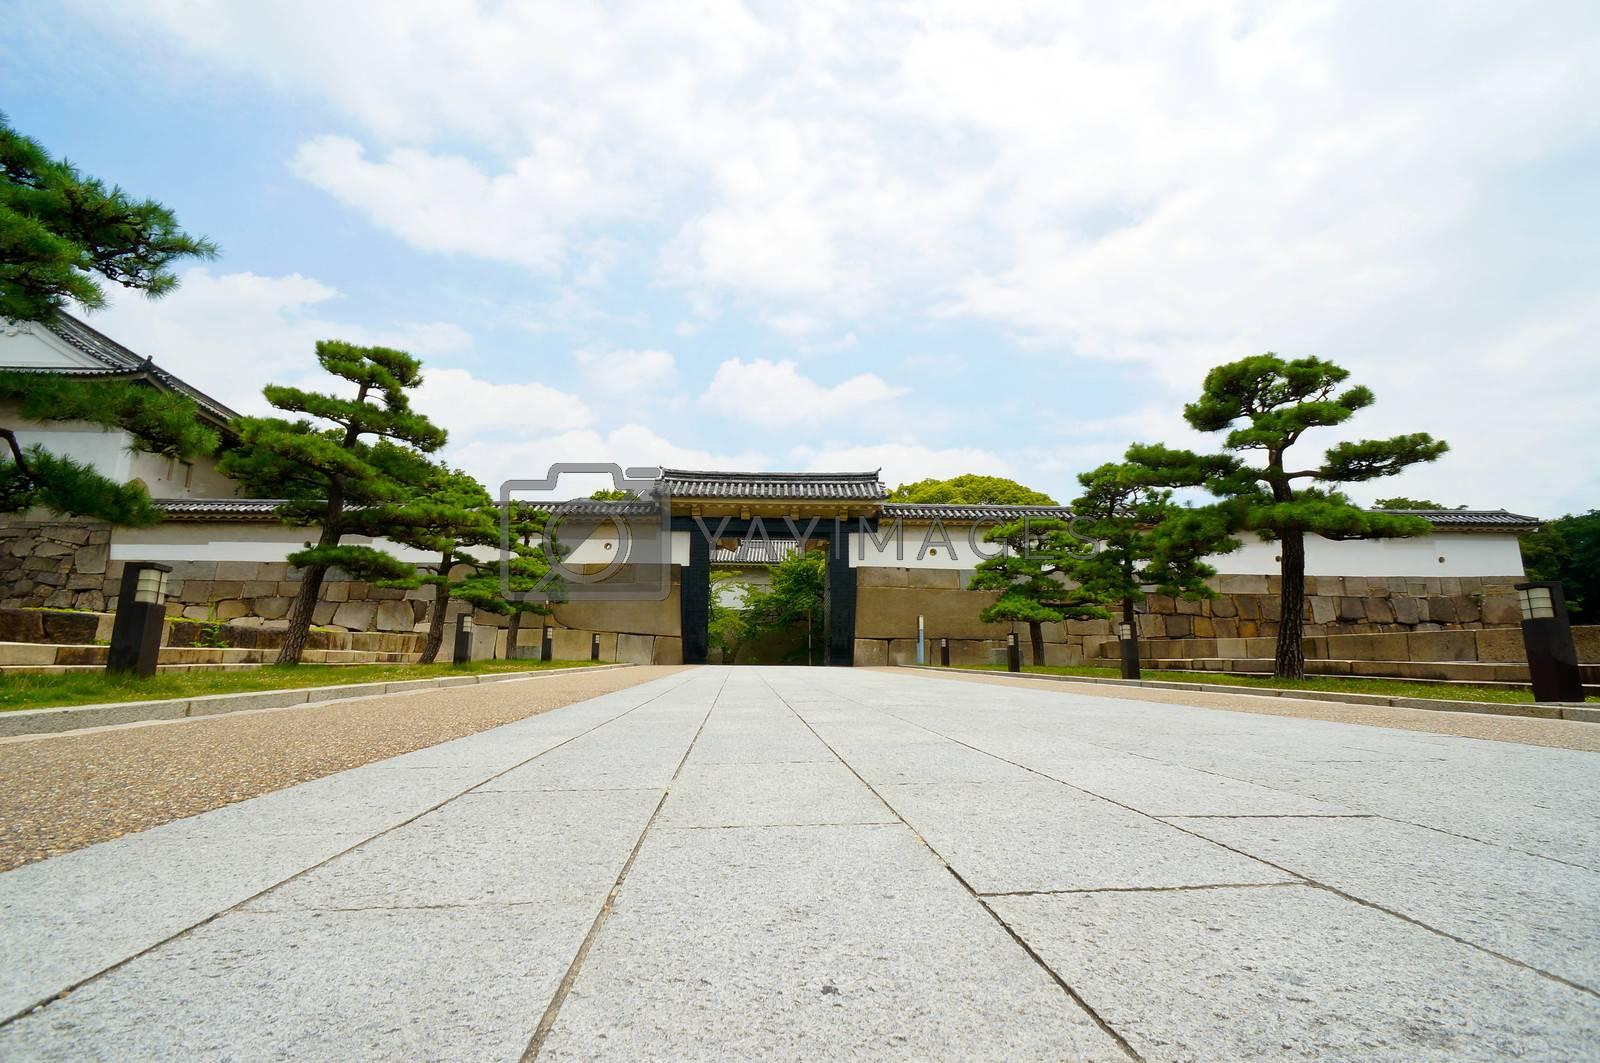 Royalty free image of Osaka by jones137hk